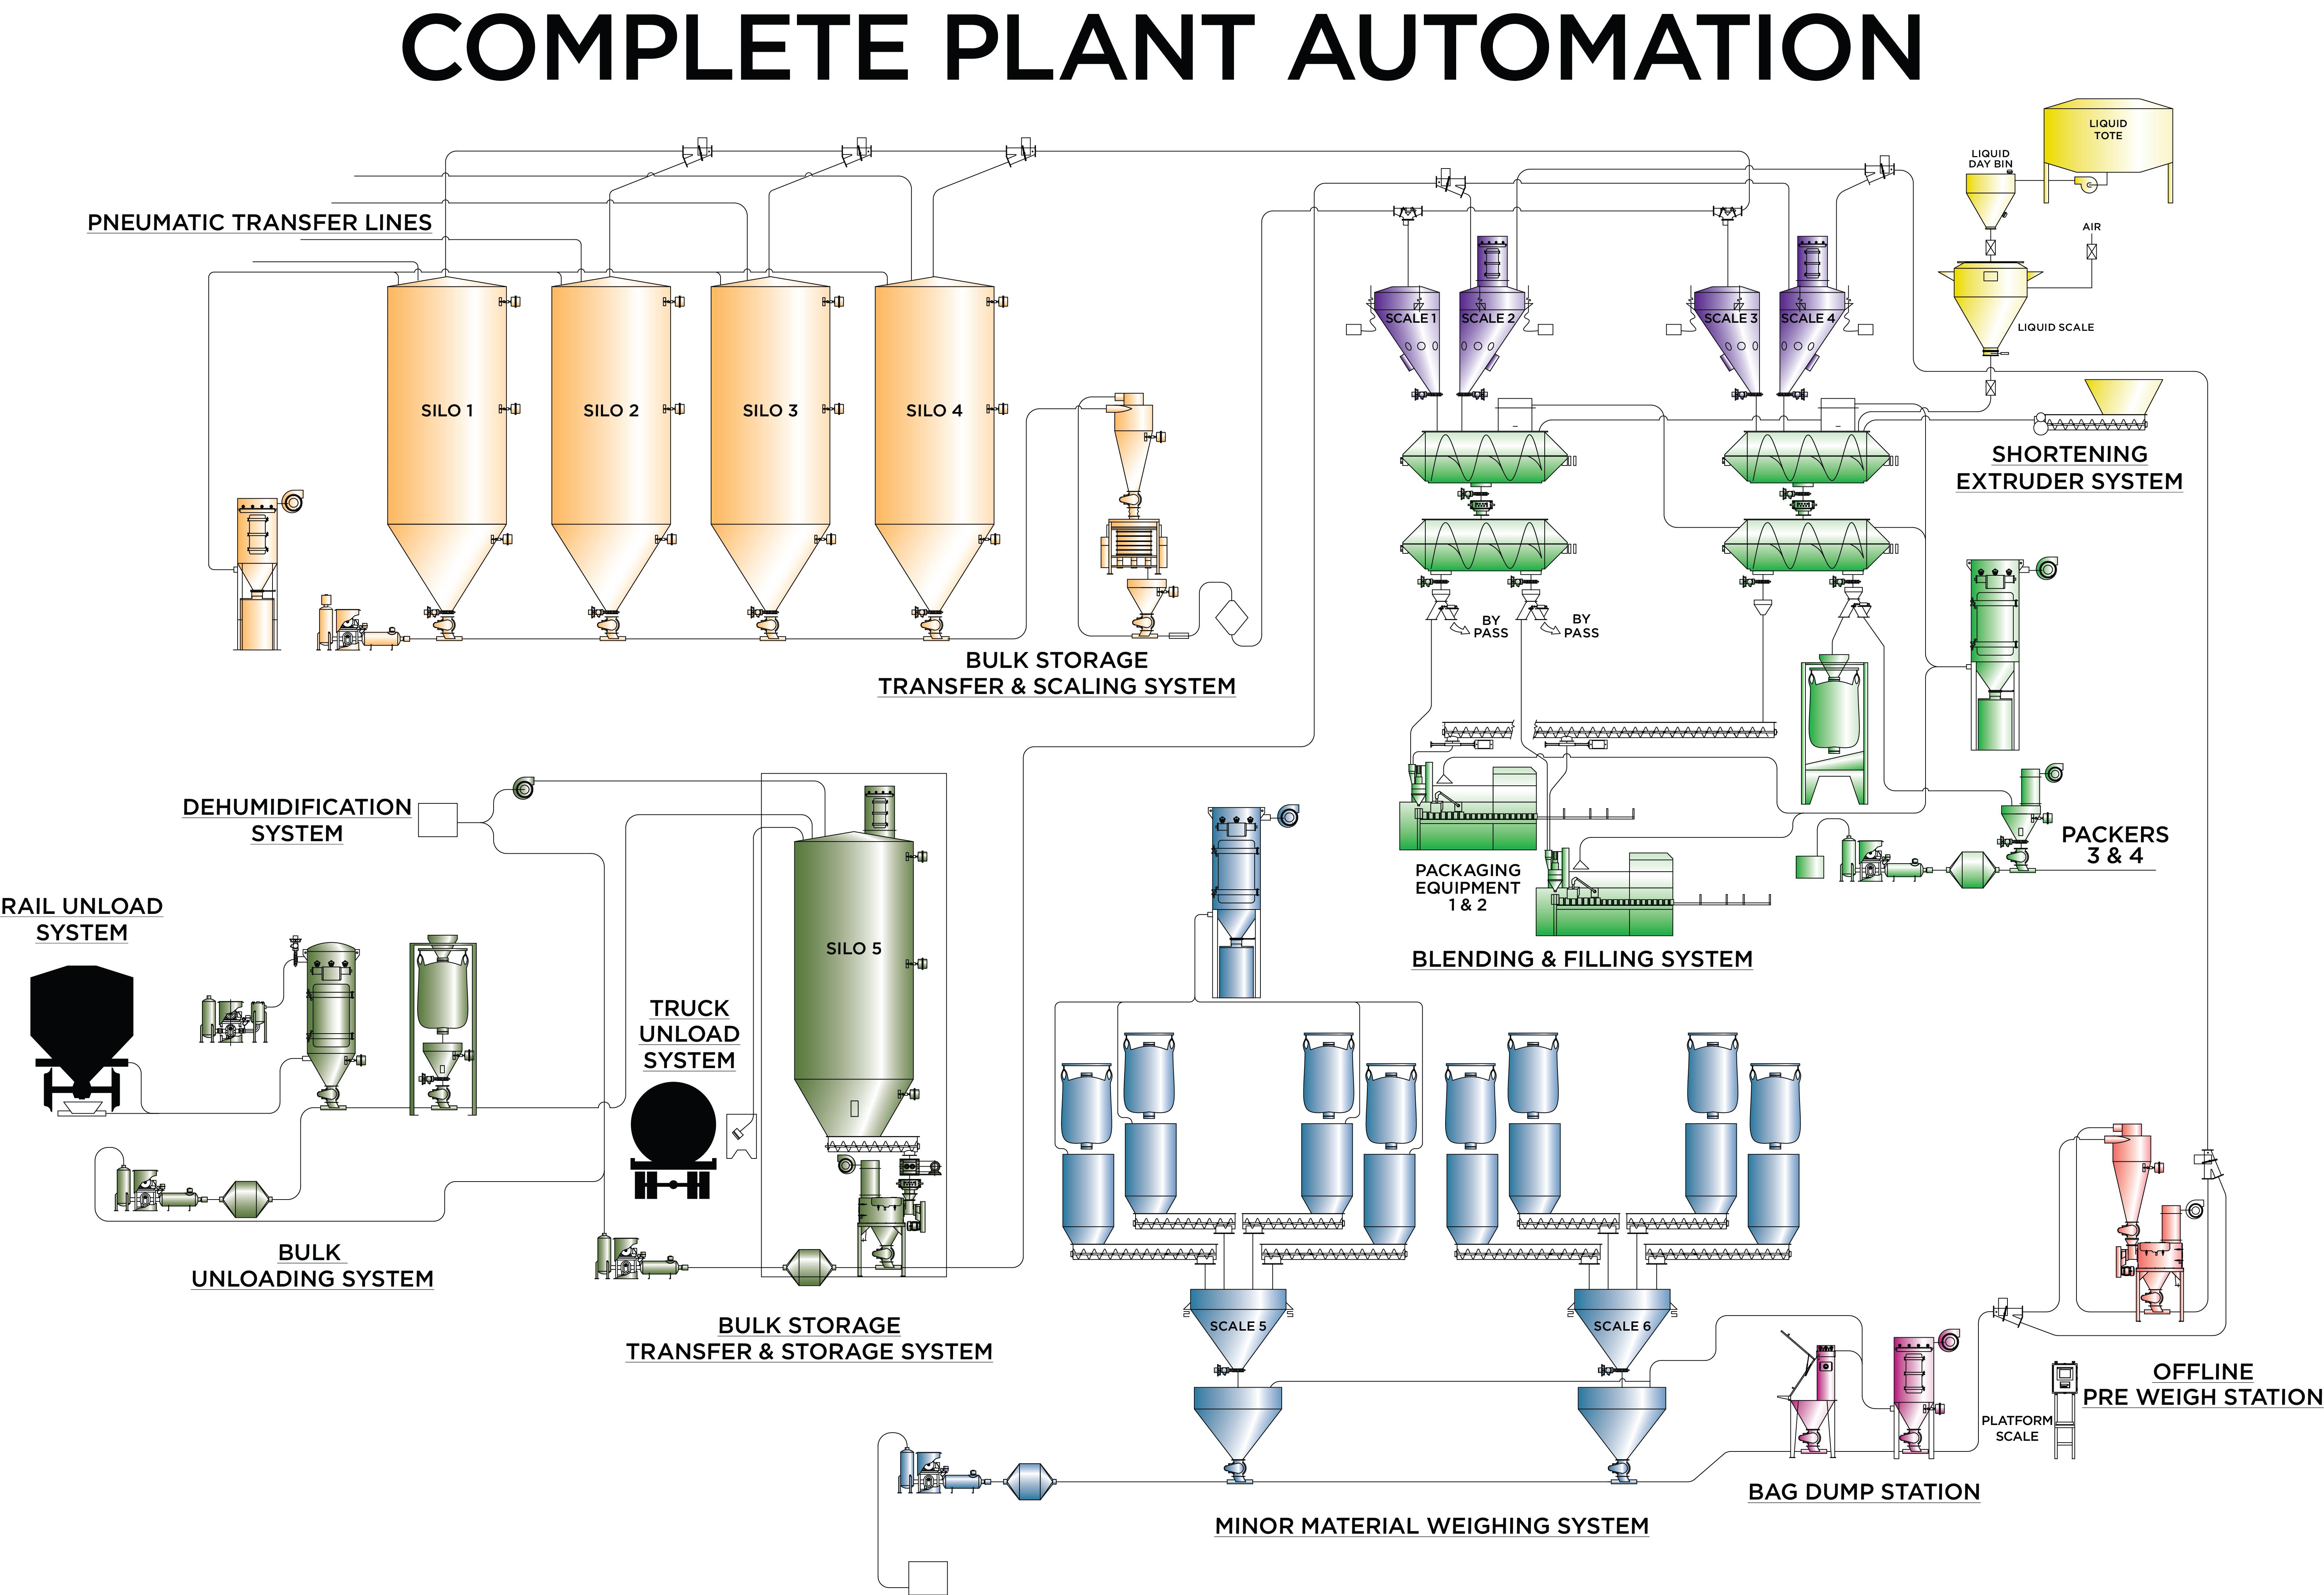 Complete Plant Automation